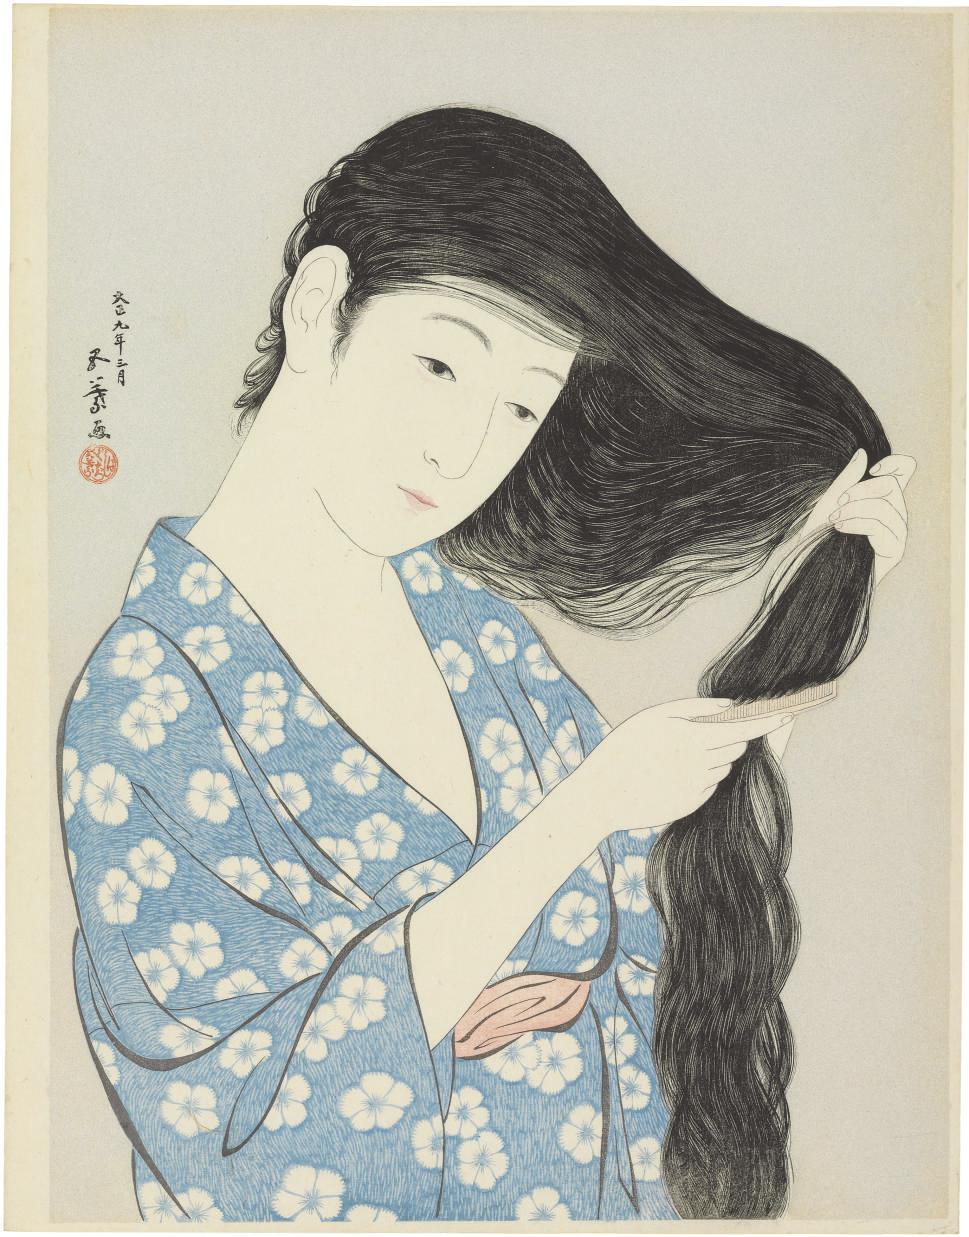 Woman brushing her hair, 1920.3  Kyoto Sanjo Ohashi (Great Bridge at Sanjo, Kyoto), 1920.1